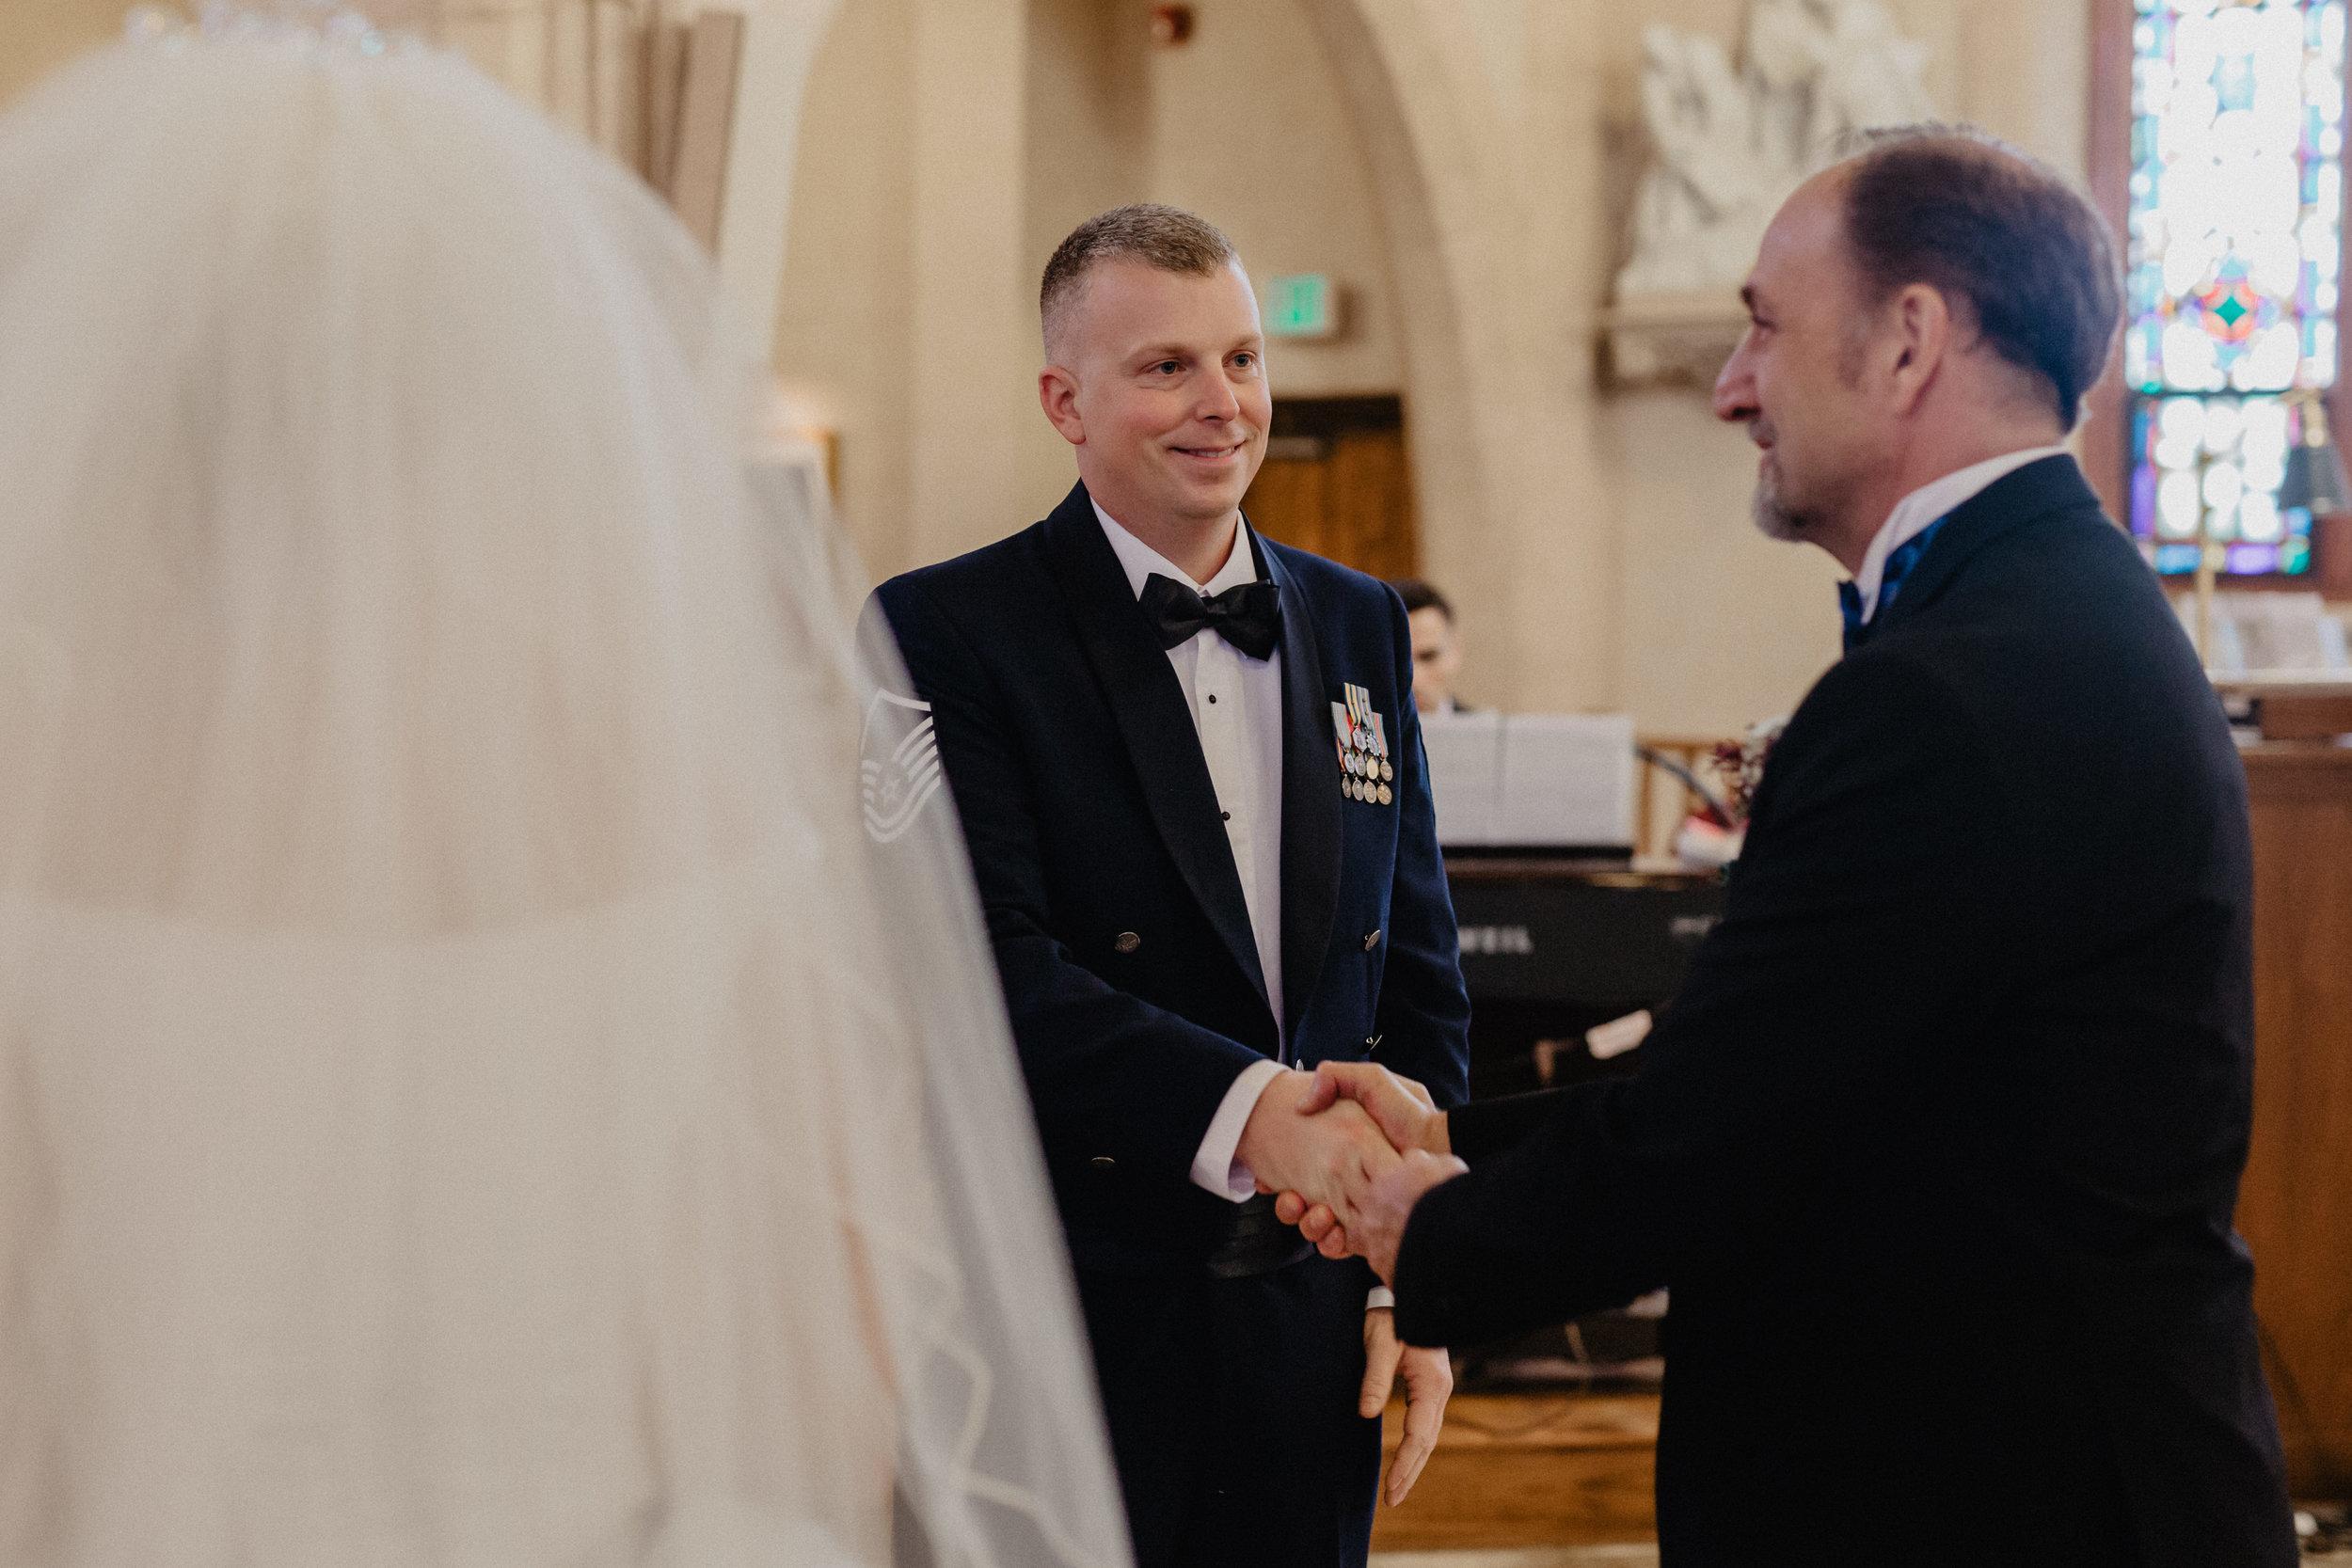 inn_at_erlowest_wedding_026.jpg